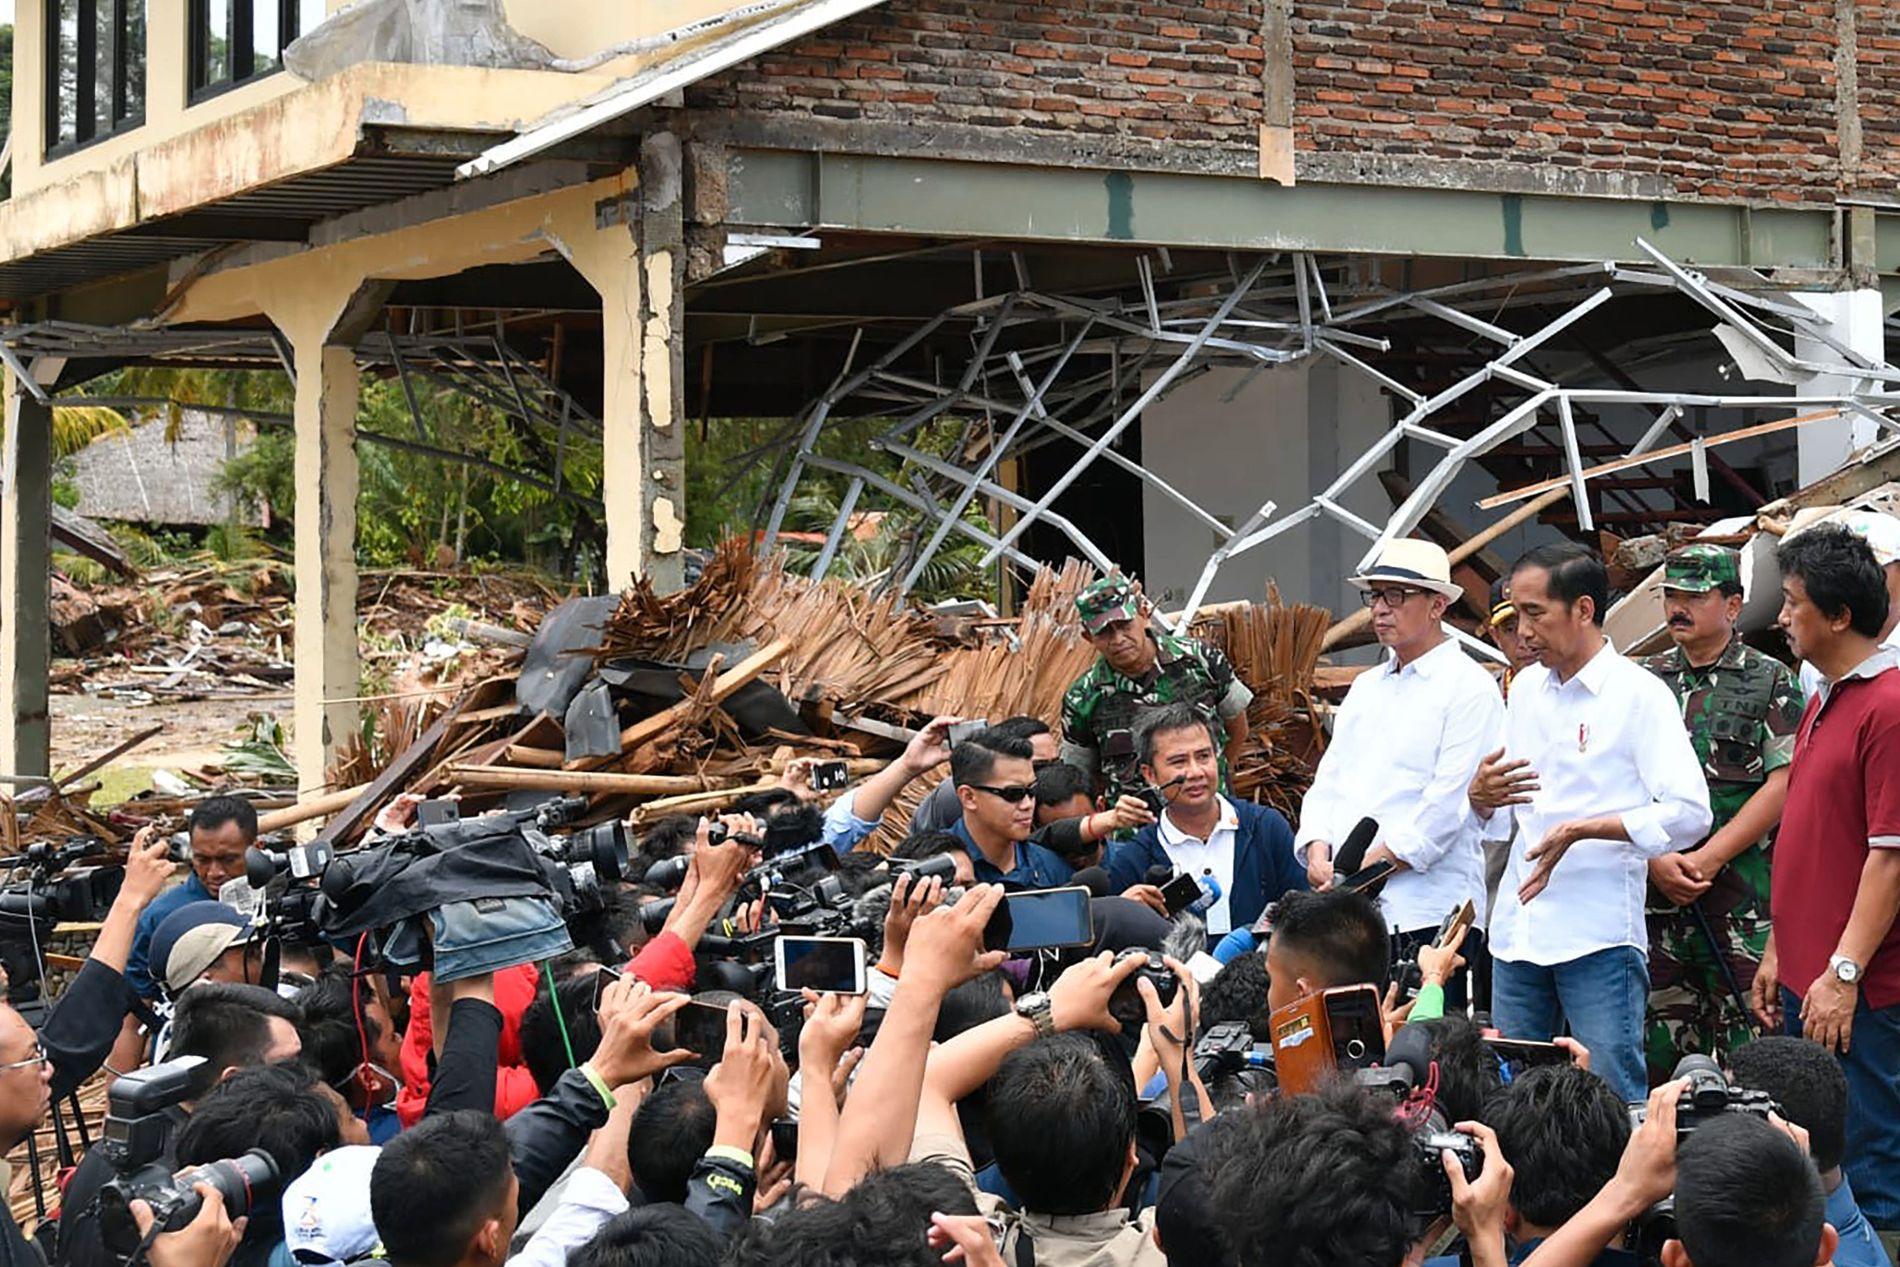 KRISERAMMET: Indonesias president Joko Widodo besøkte mandag den kriserammede landsbyen Carita.